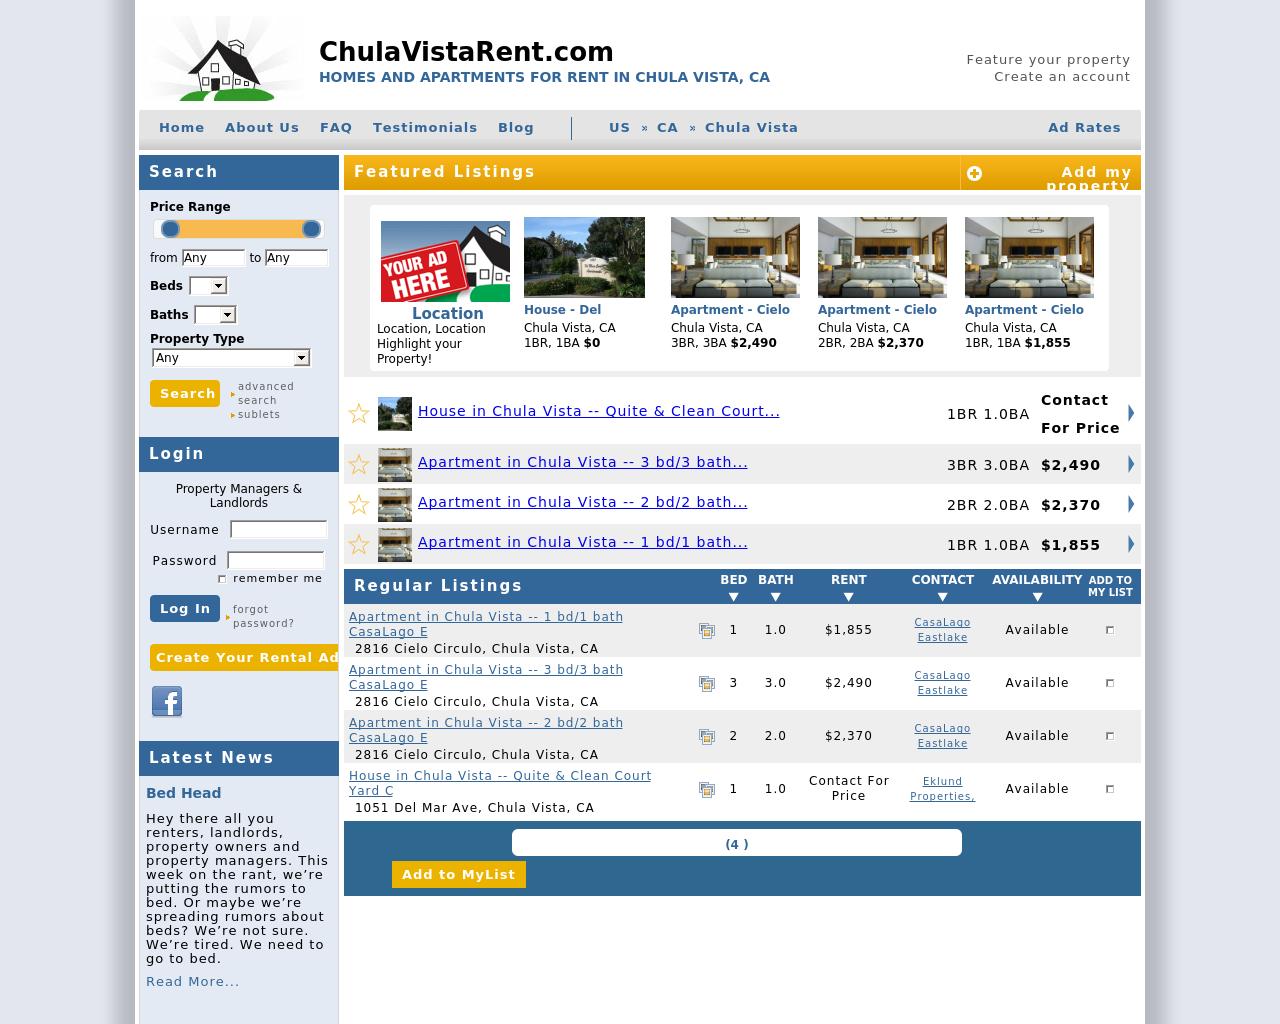 Chula-Vista-Rent-Advertising-Reviews-Pricing